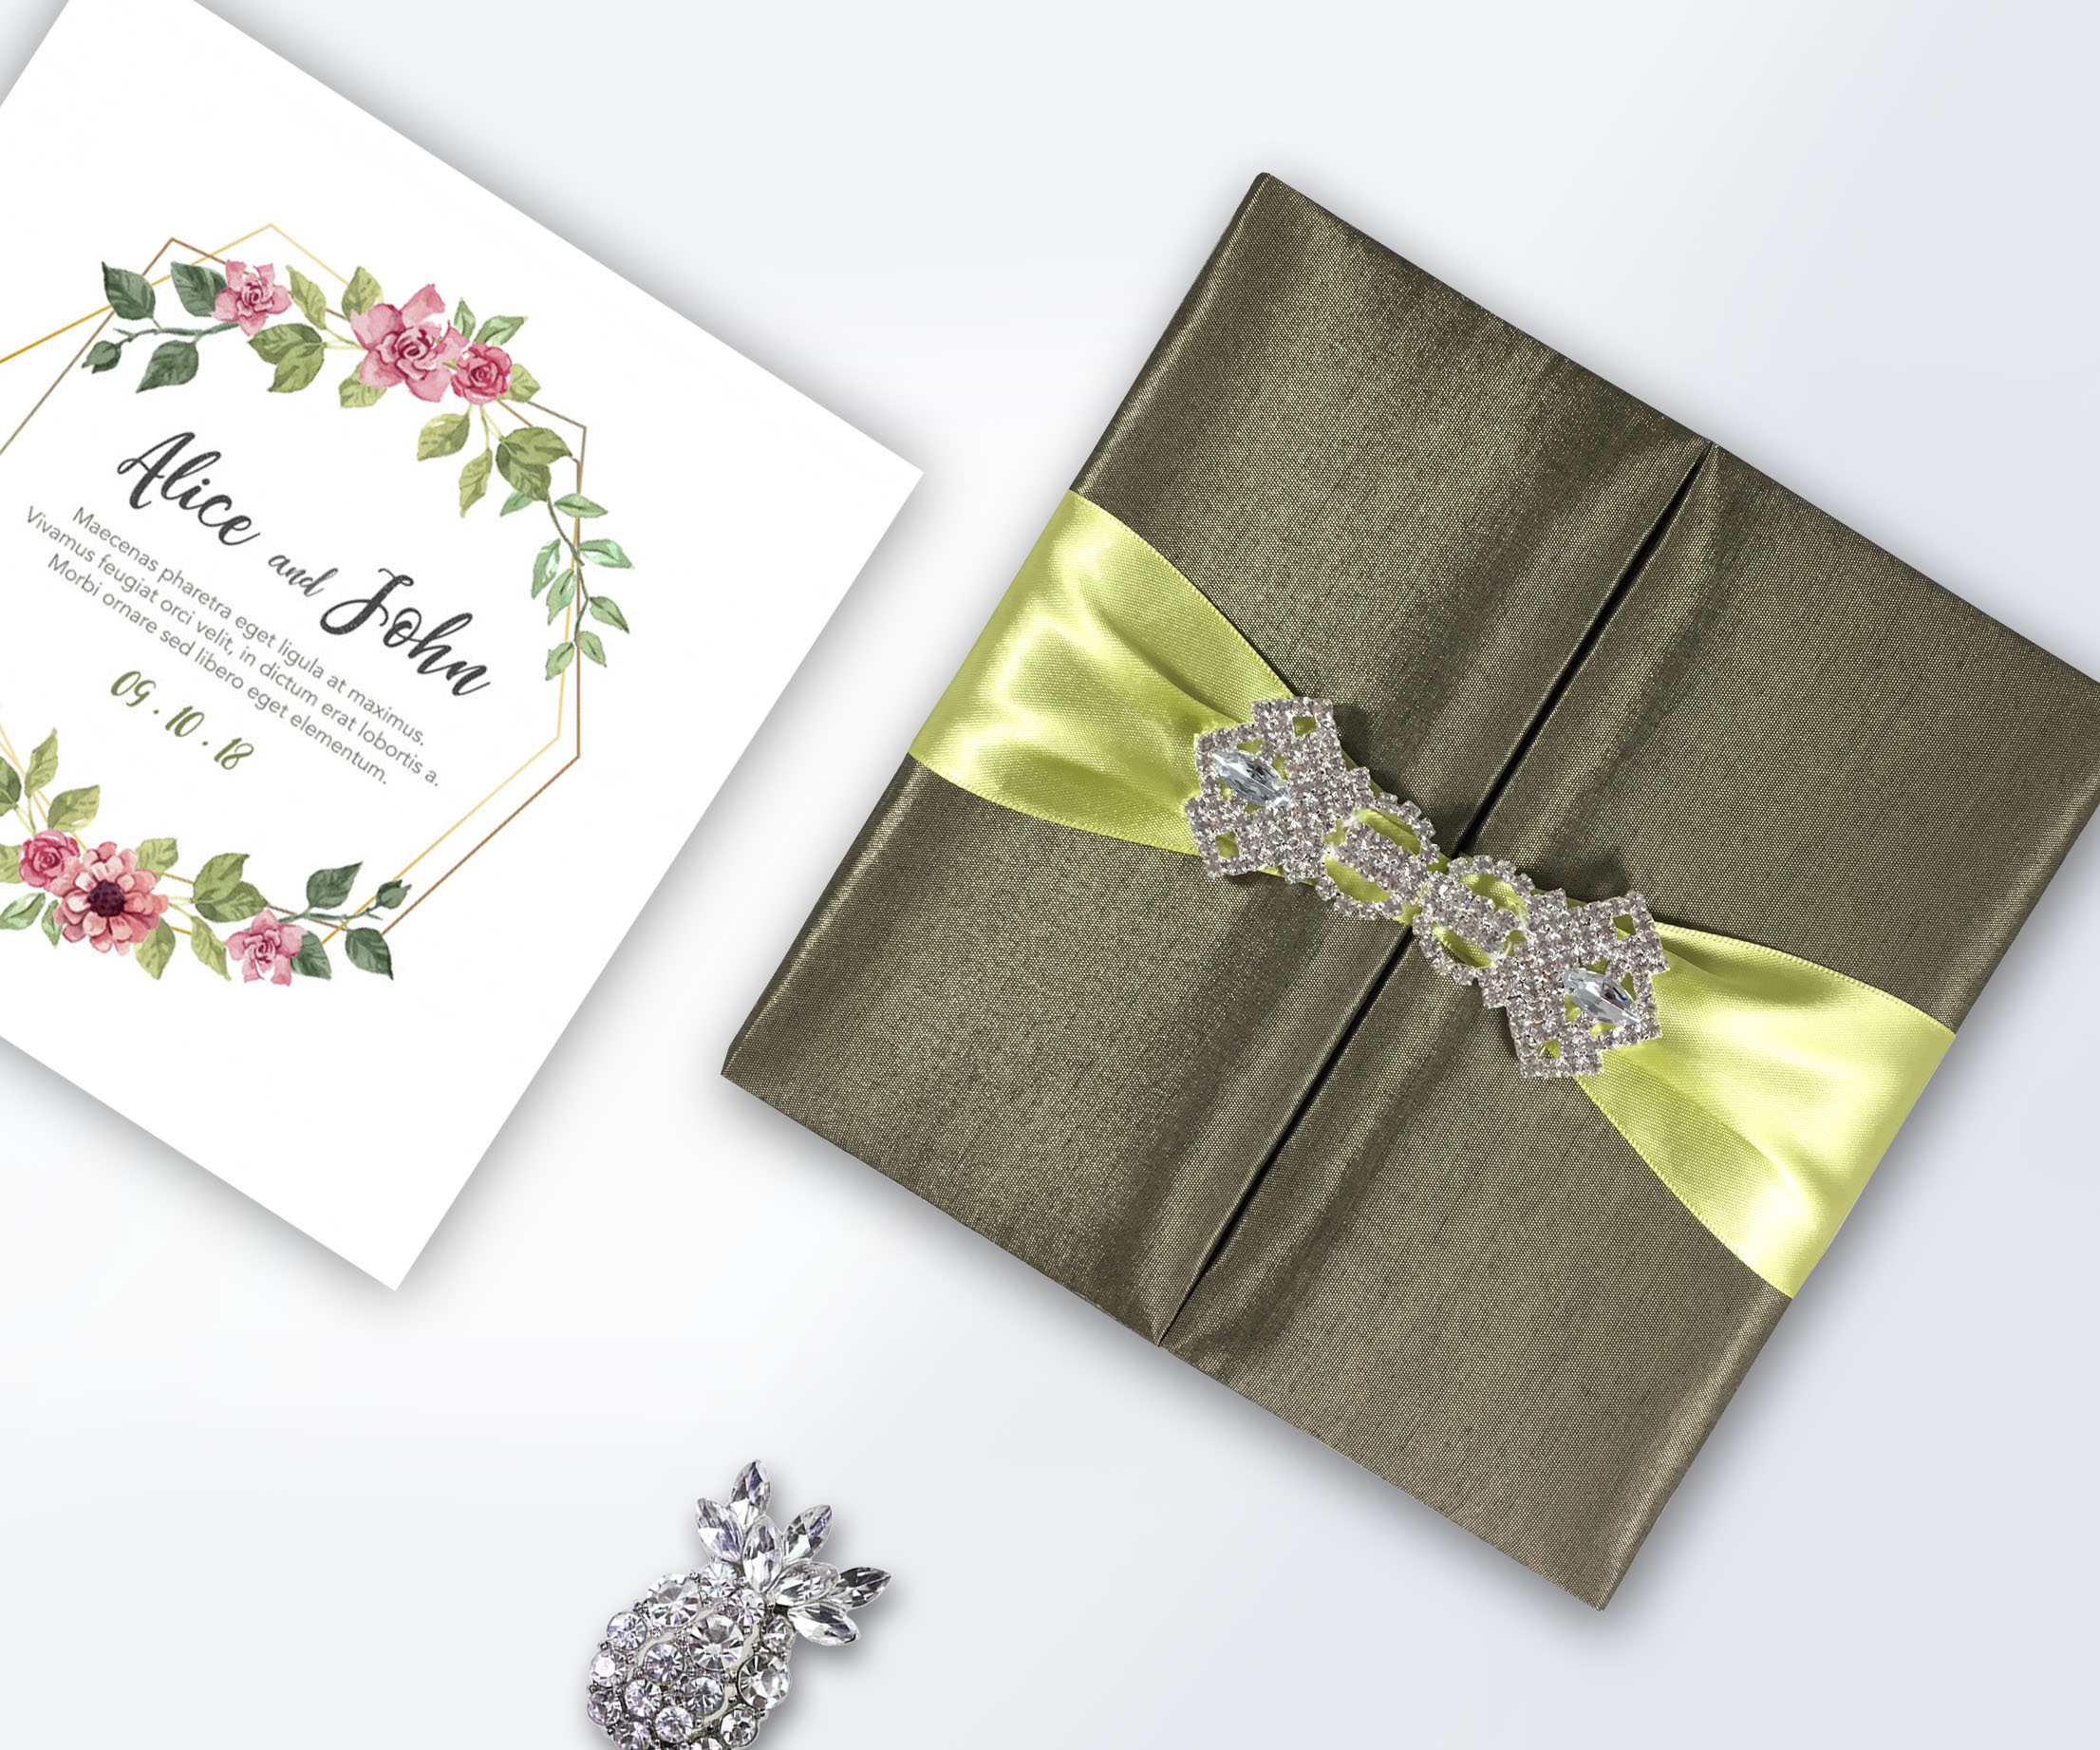 uniform green silk wedding box with chartreuse ribbon and crystal brooch